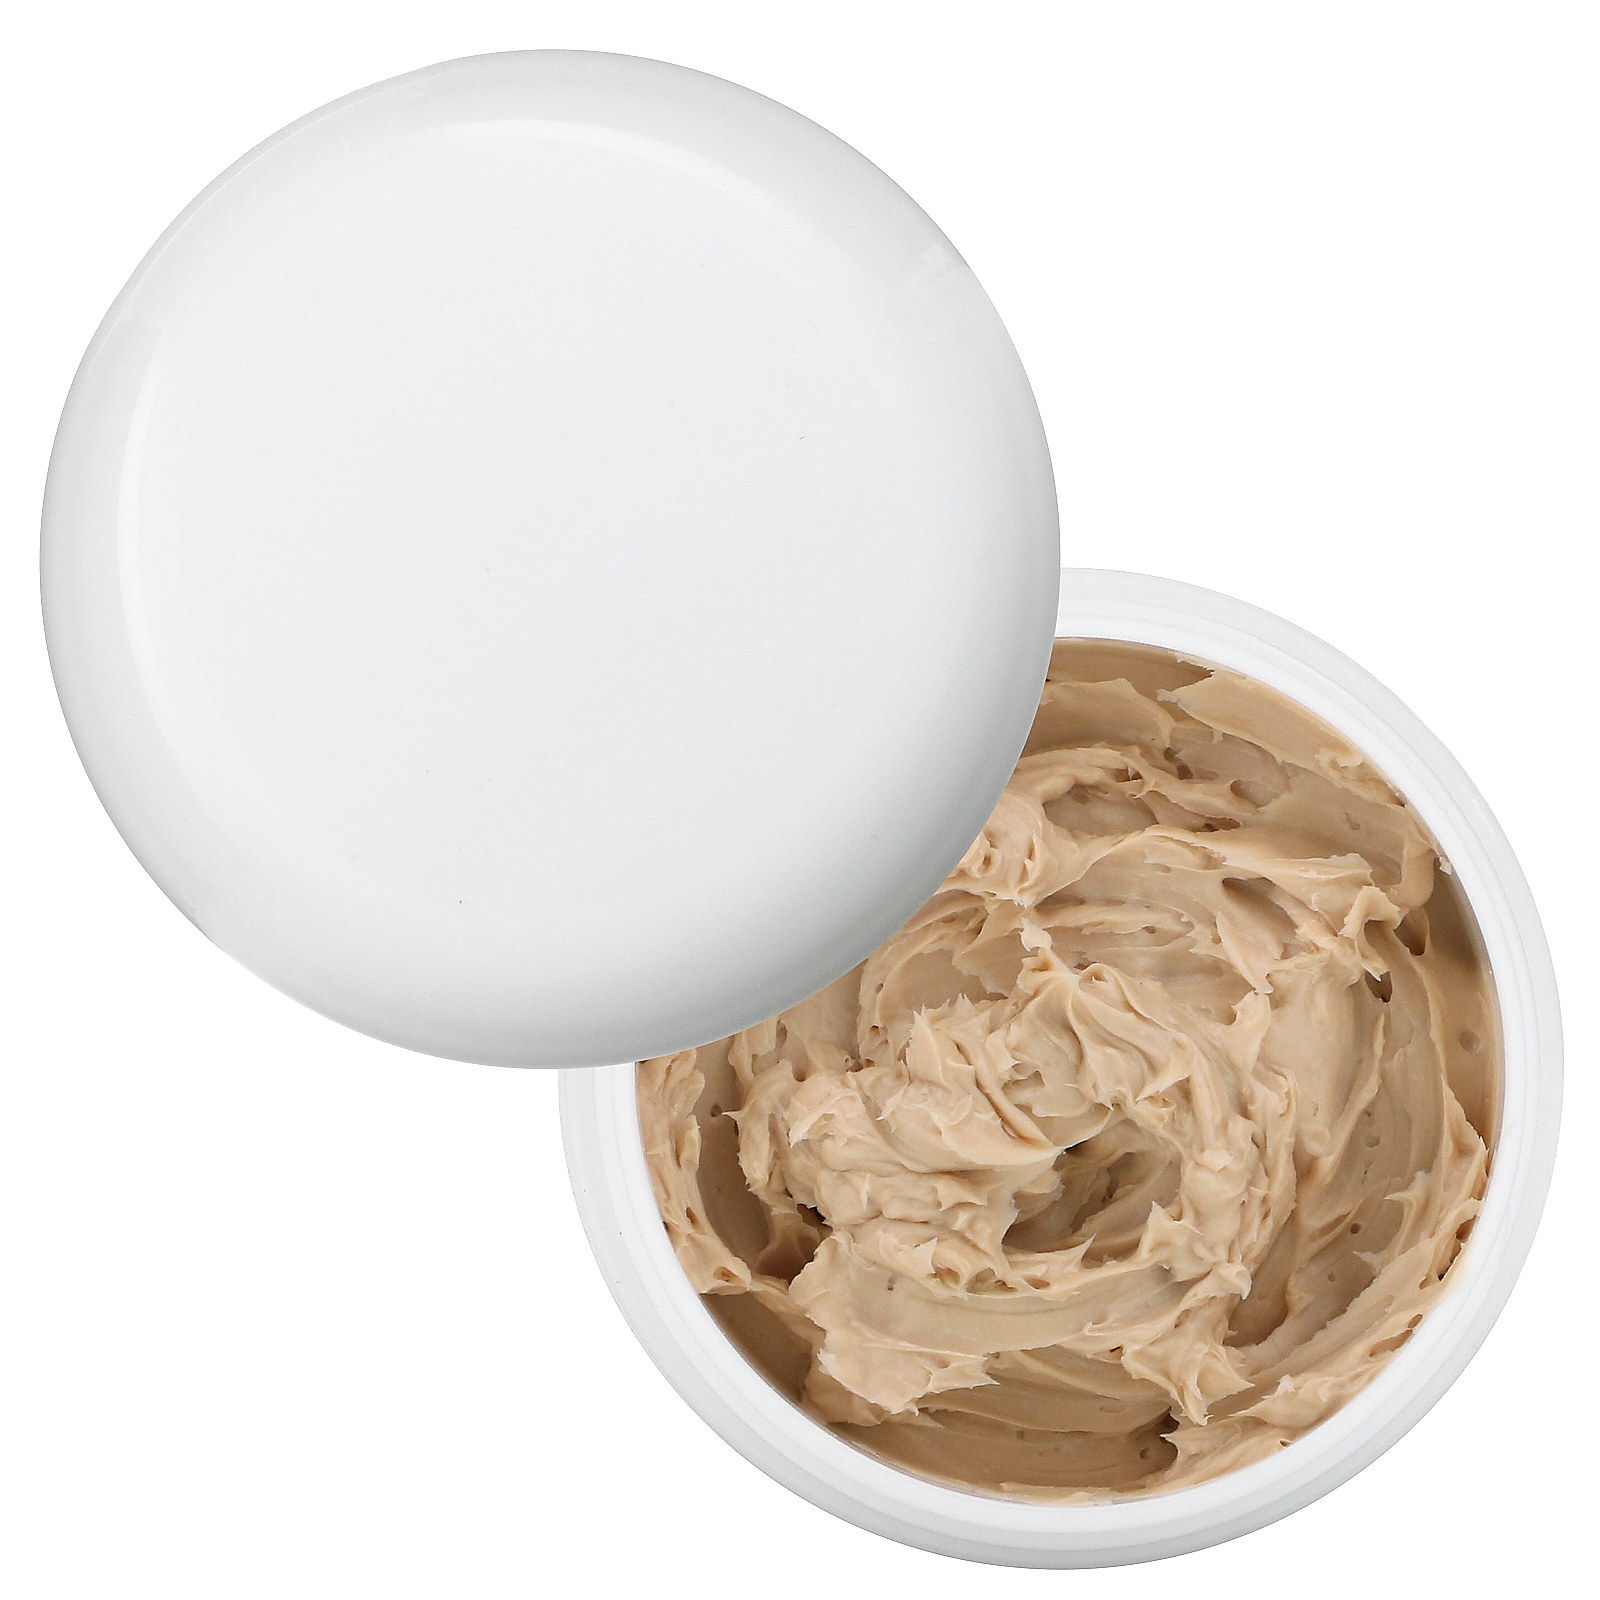 home health psoriasis cream отзывы